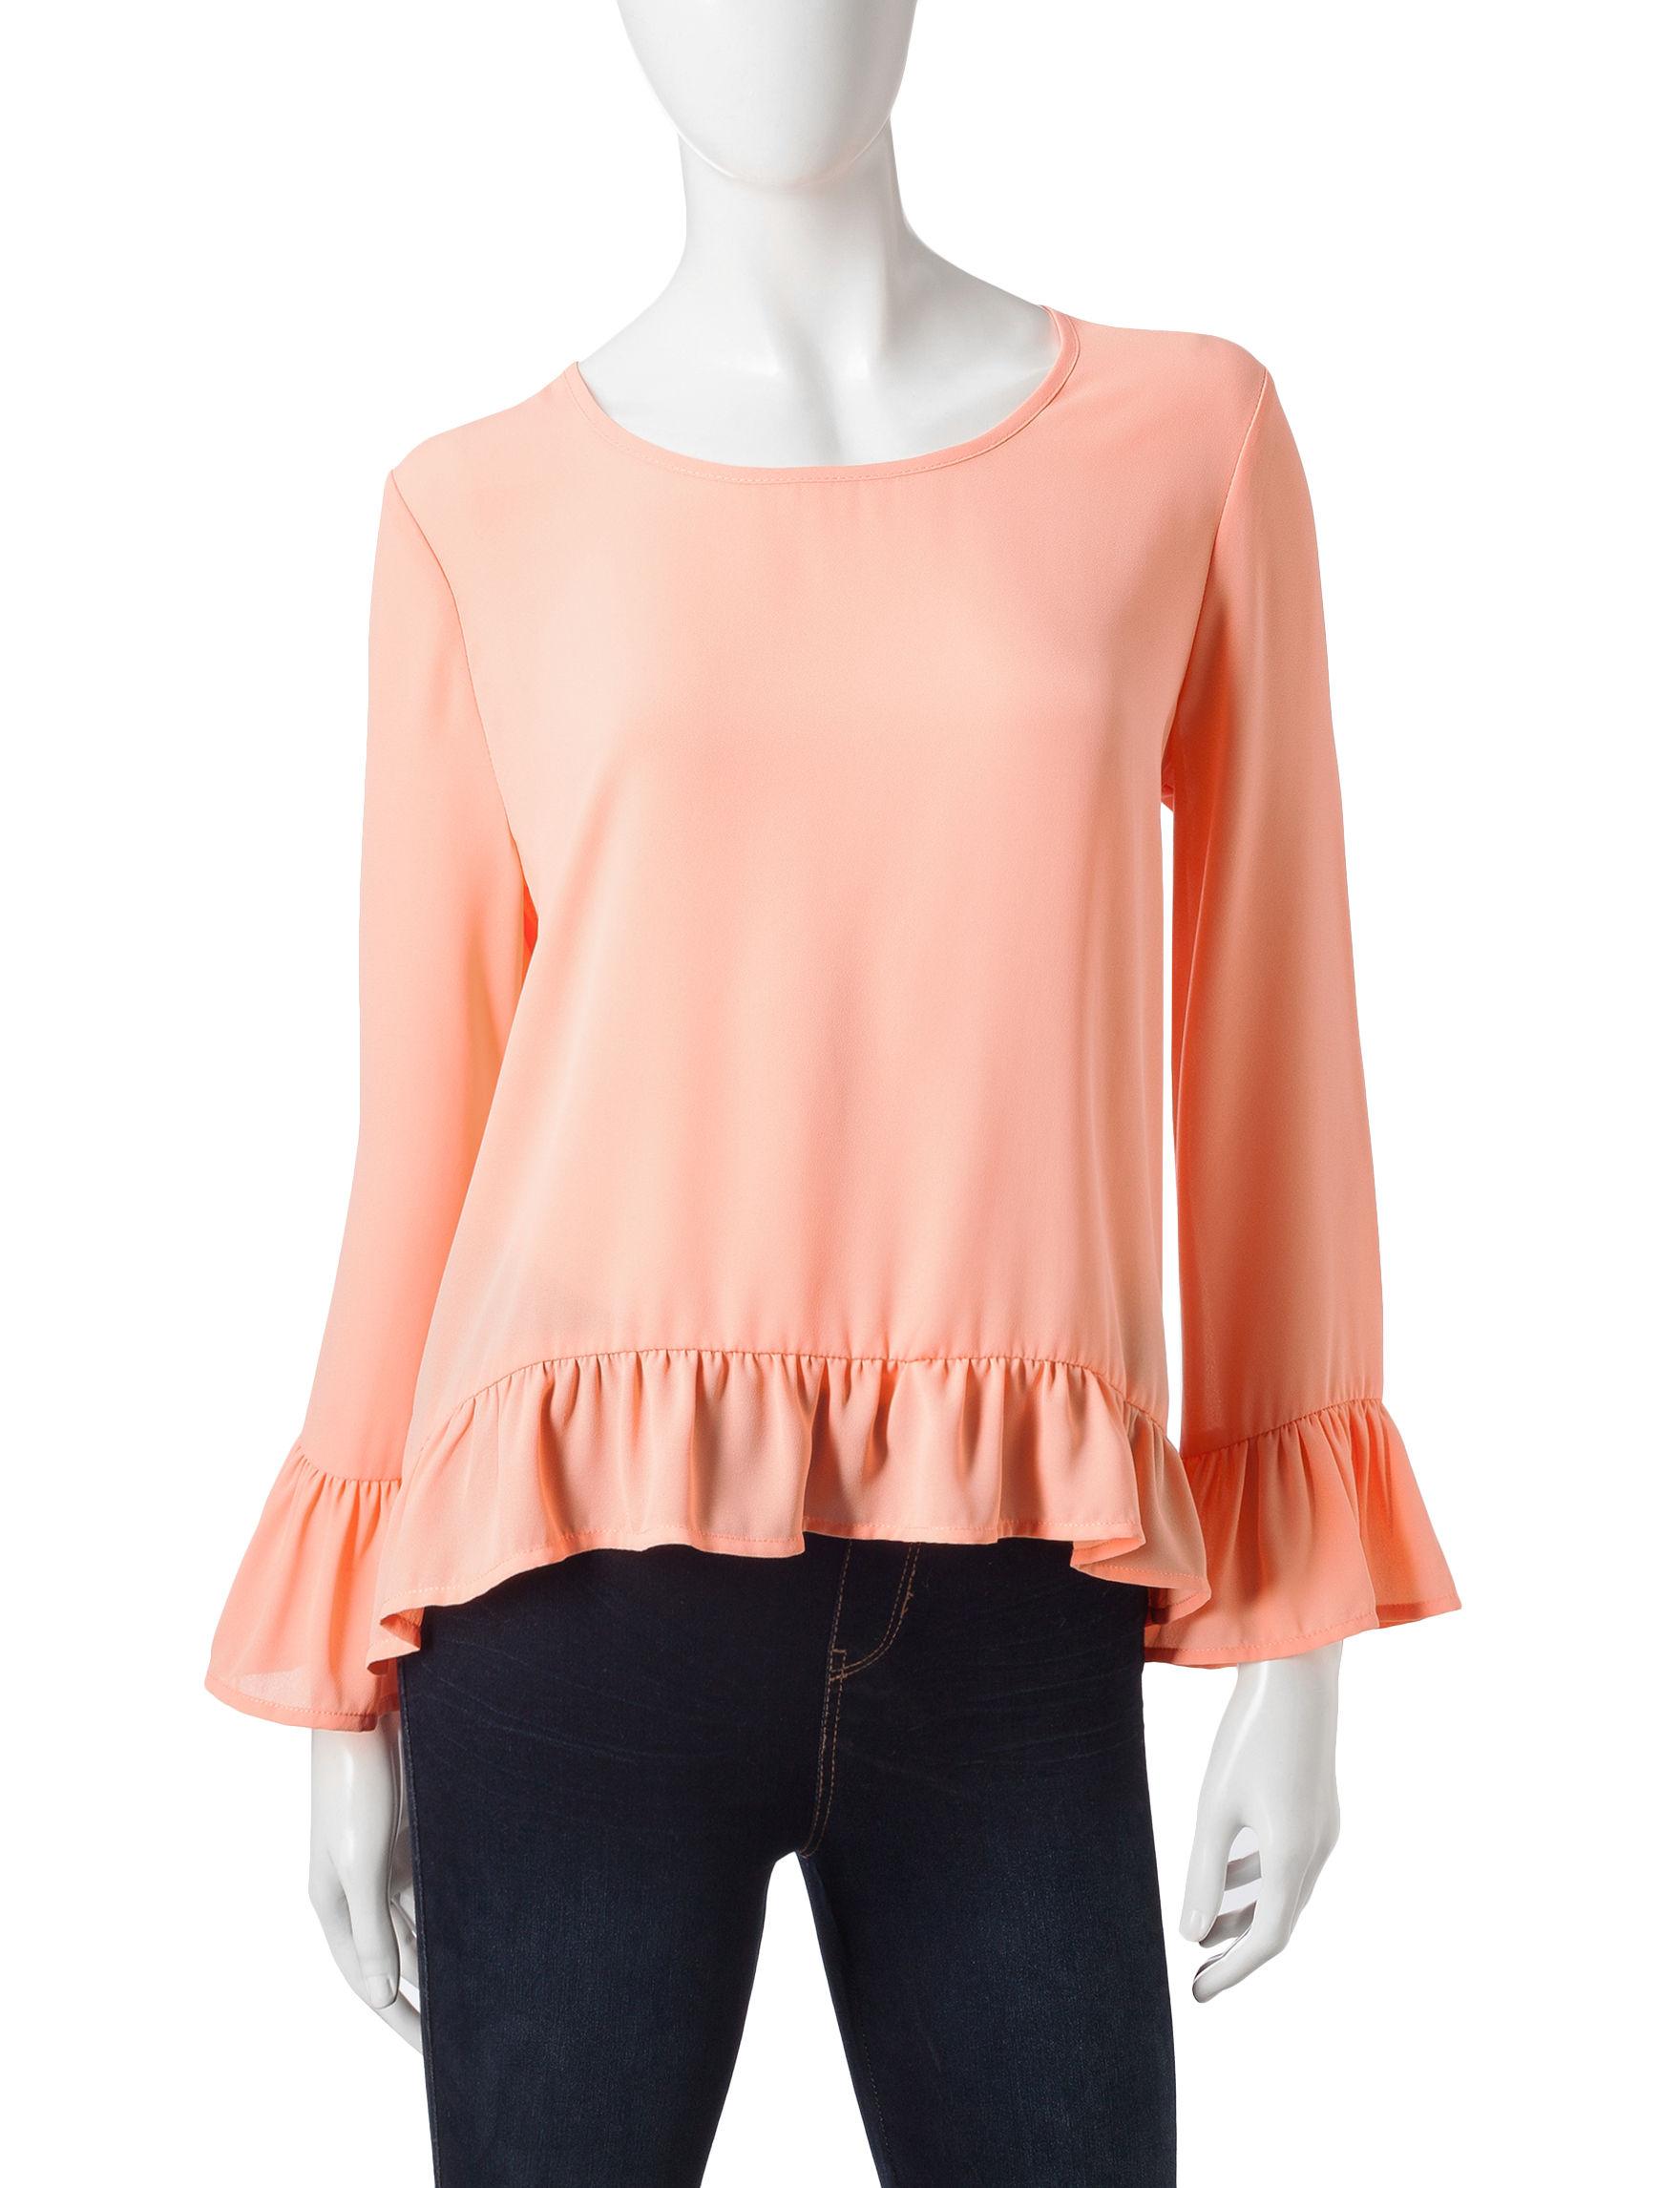 Wishful Park Pink Shirts & Blouses